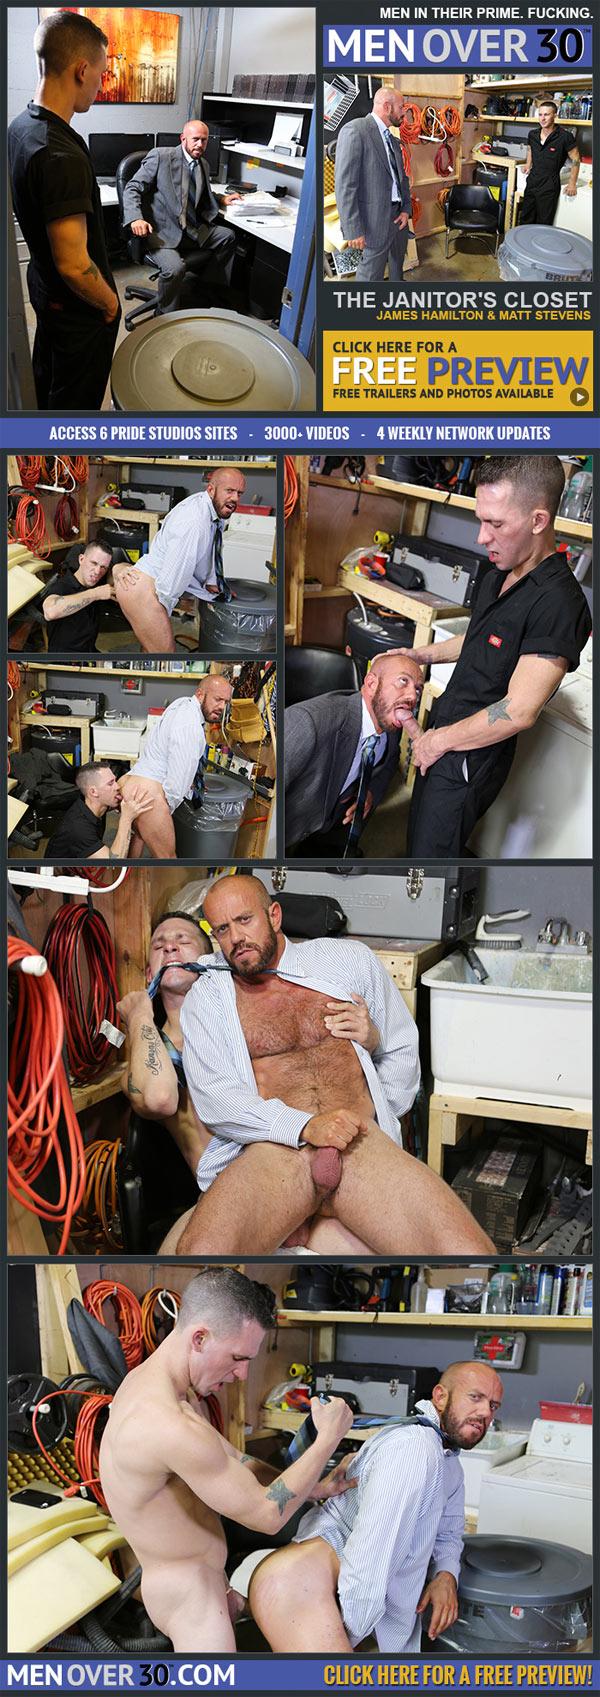 The Janitor's Closet (James Hamilton & Matt Stevens) at MenOver30